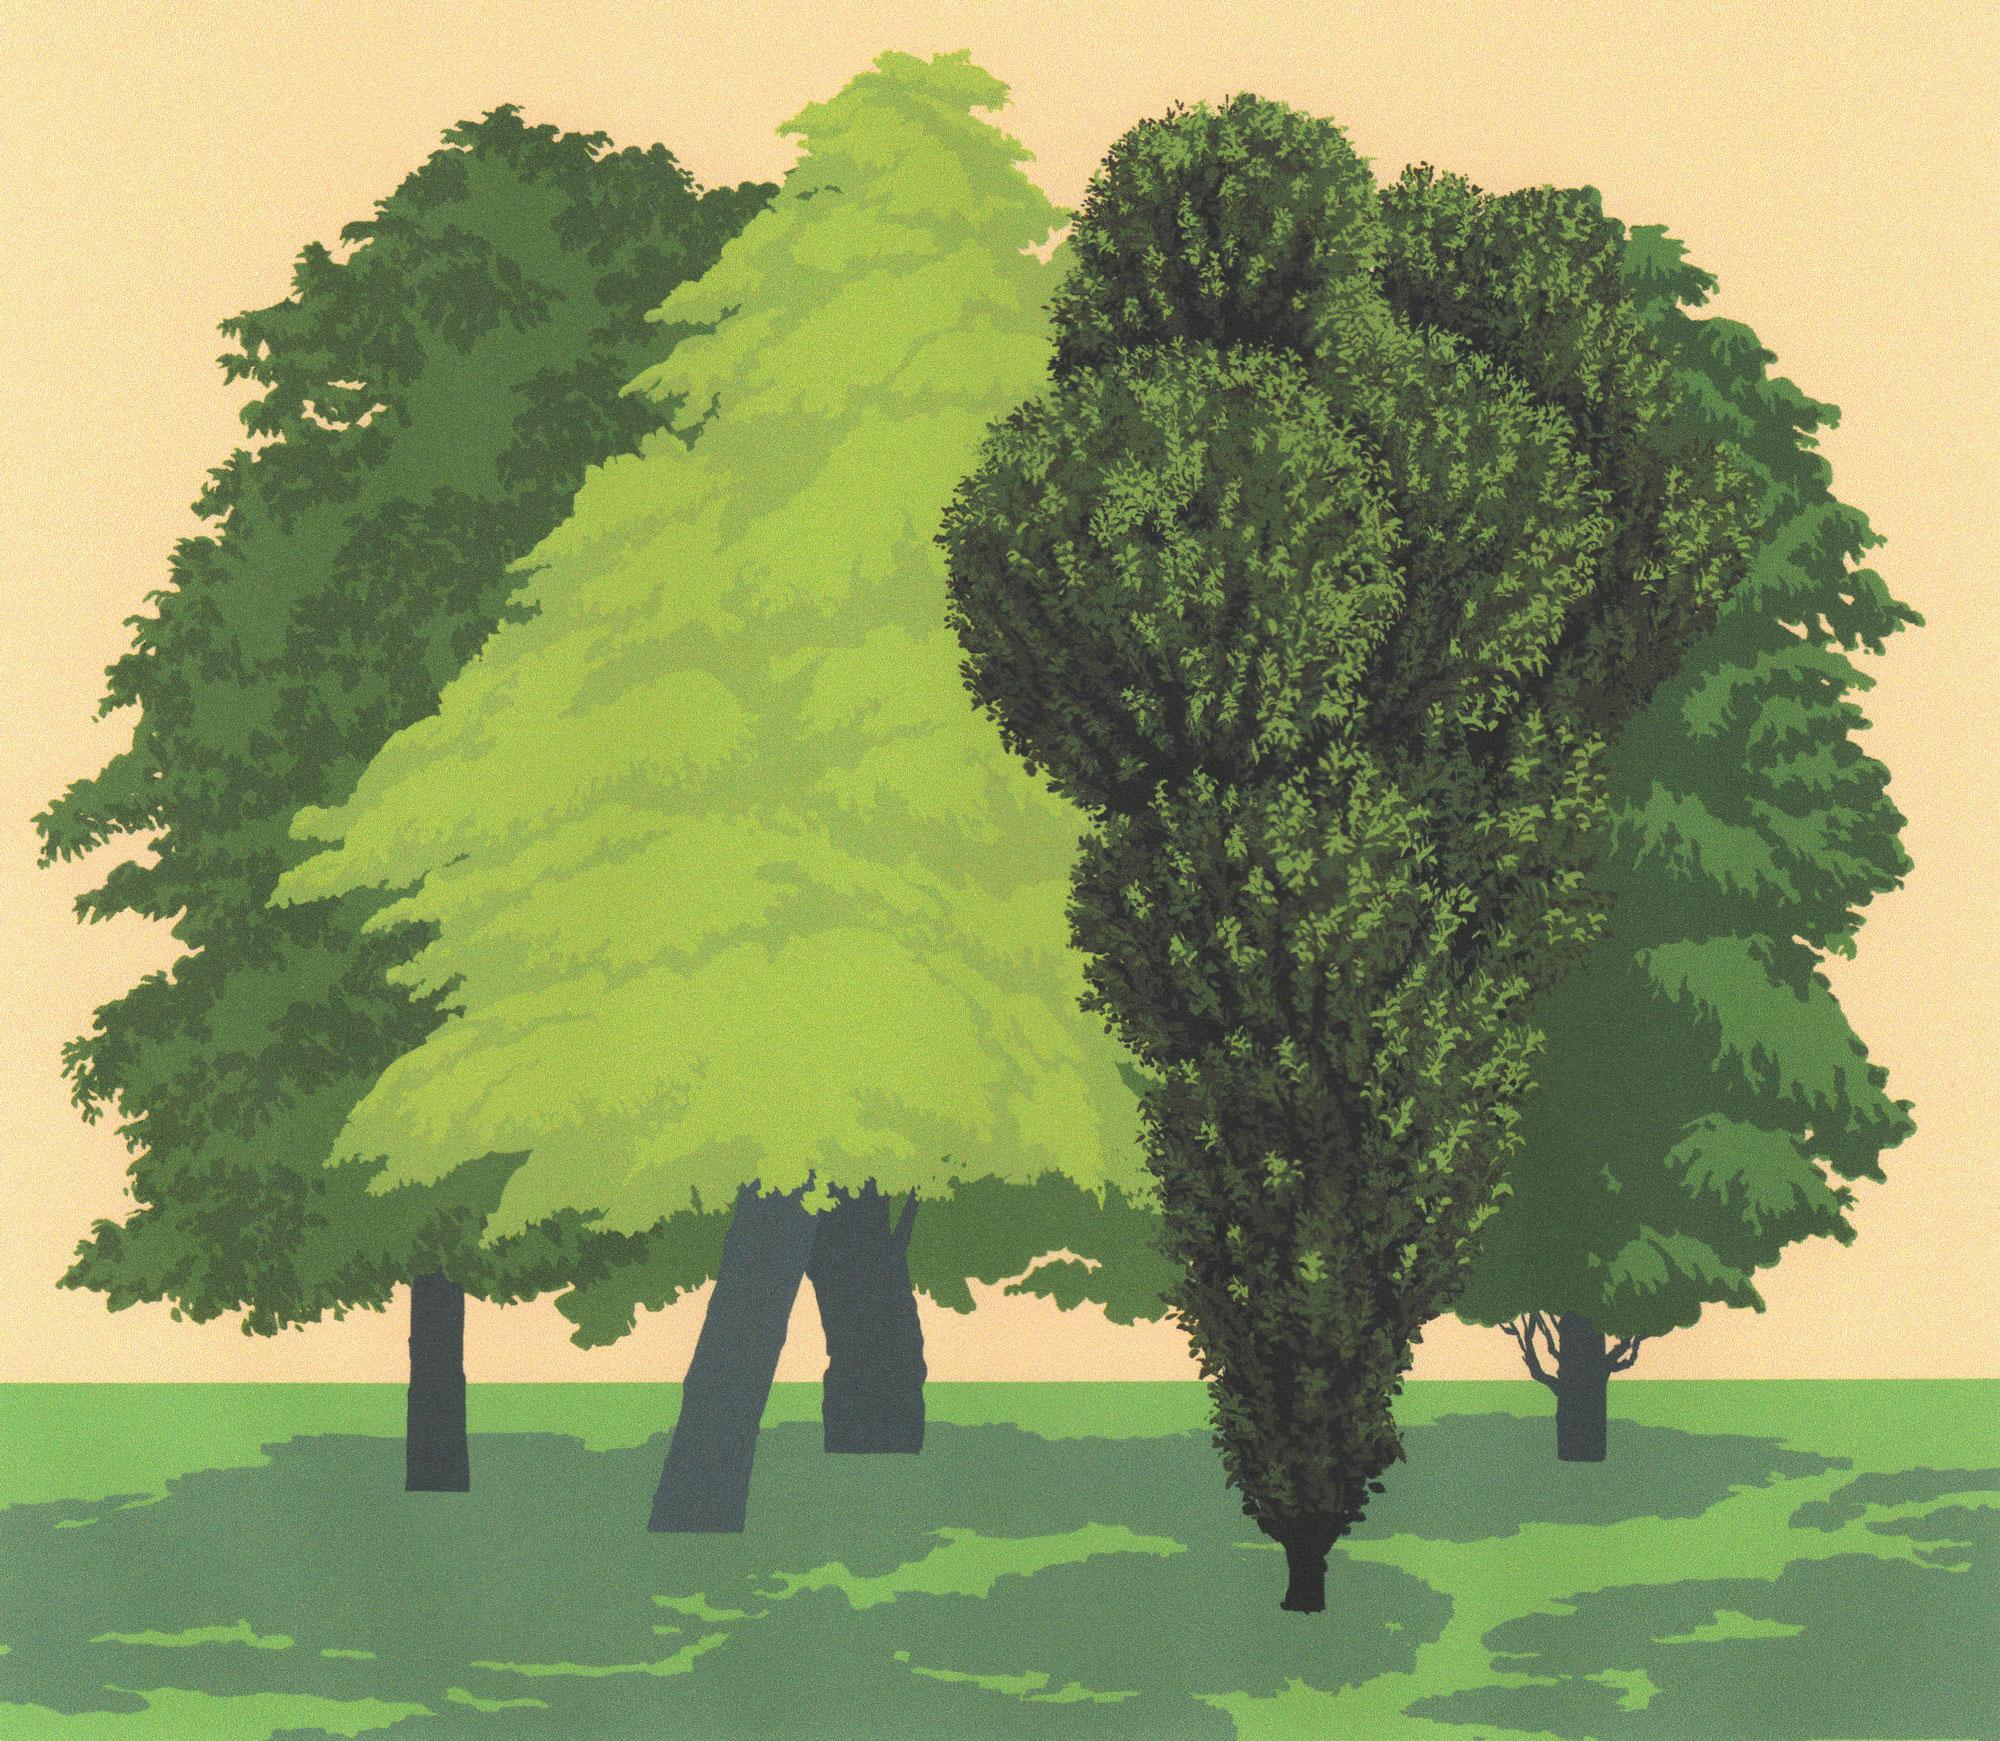 Intriguing Illustrations by Manshen Lo